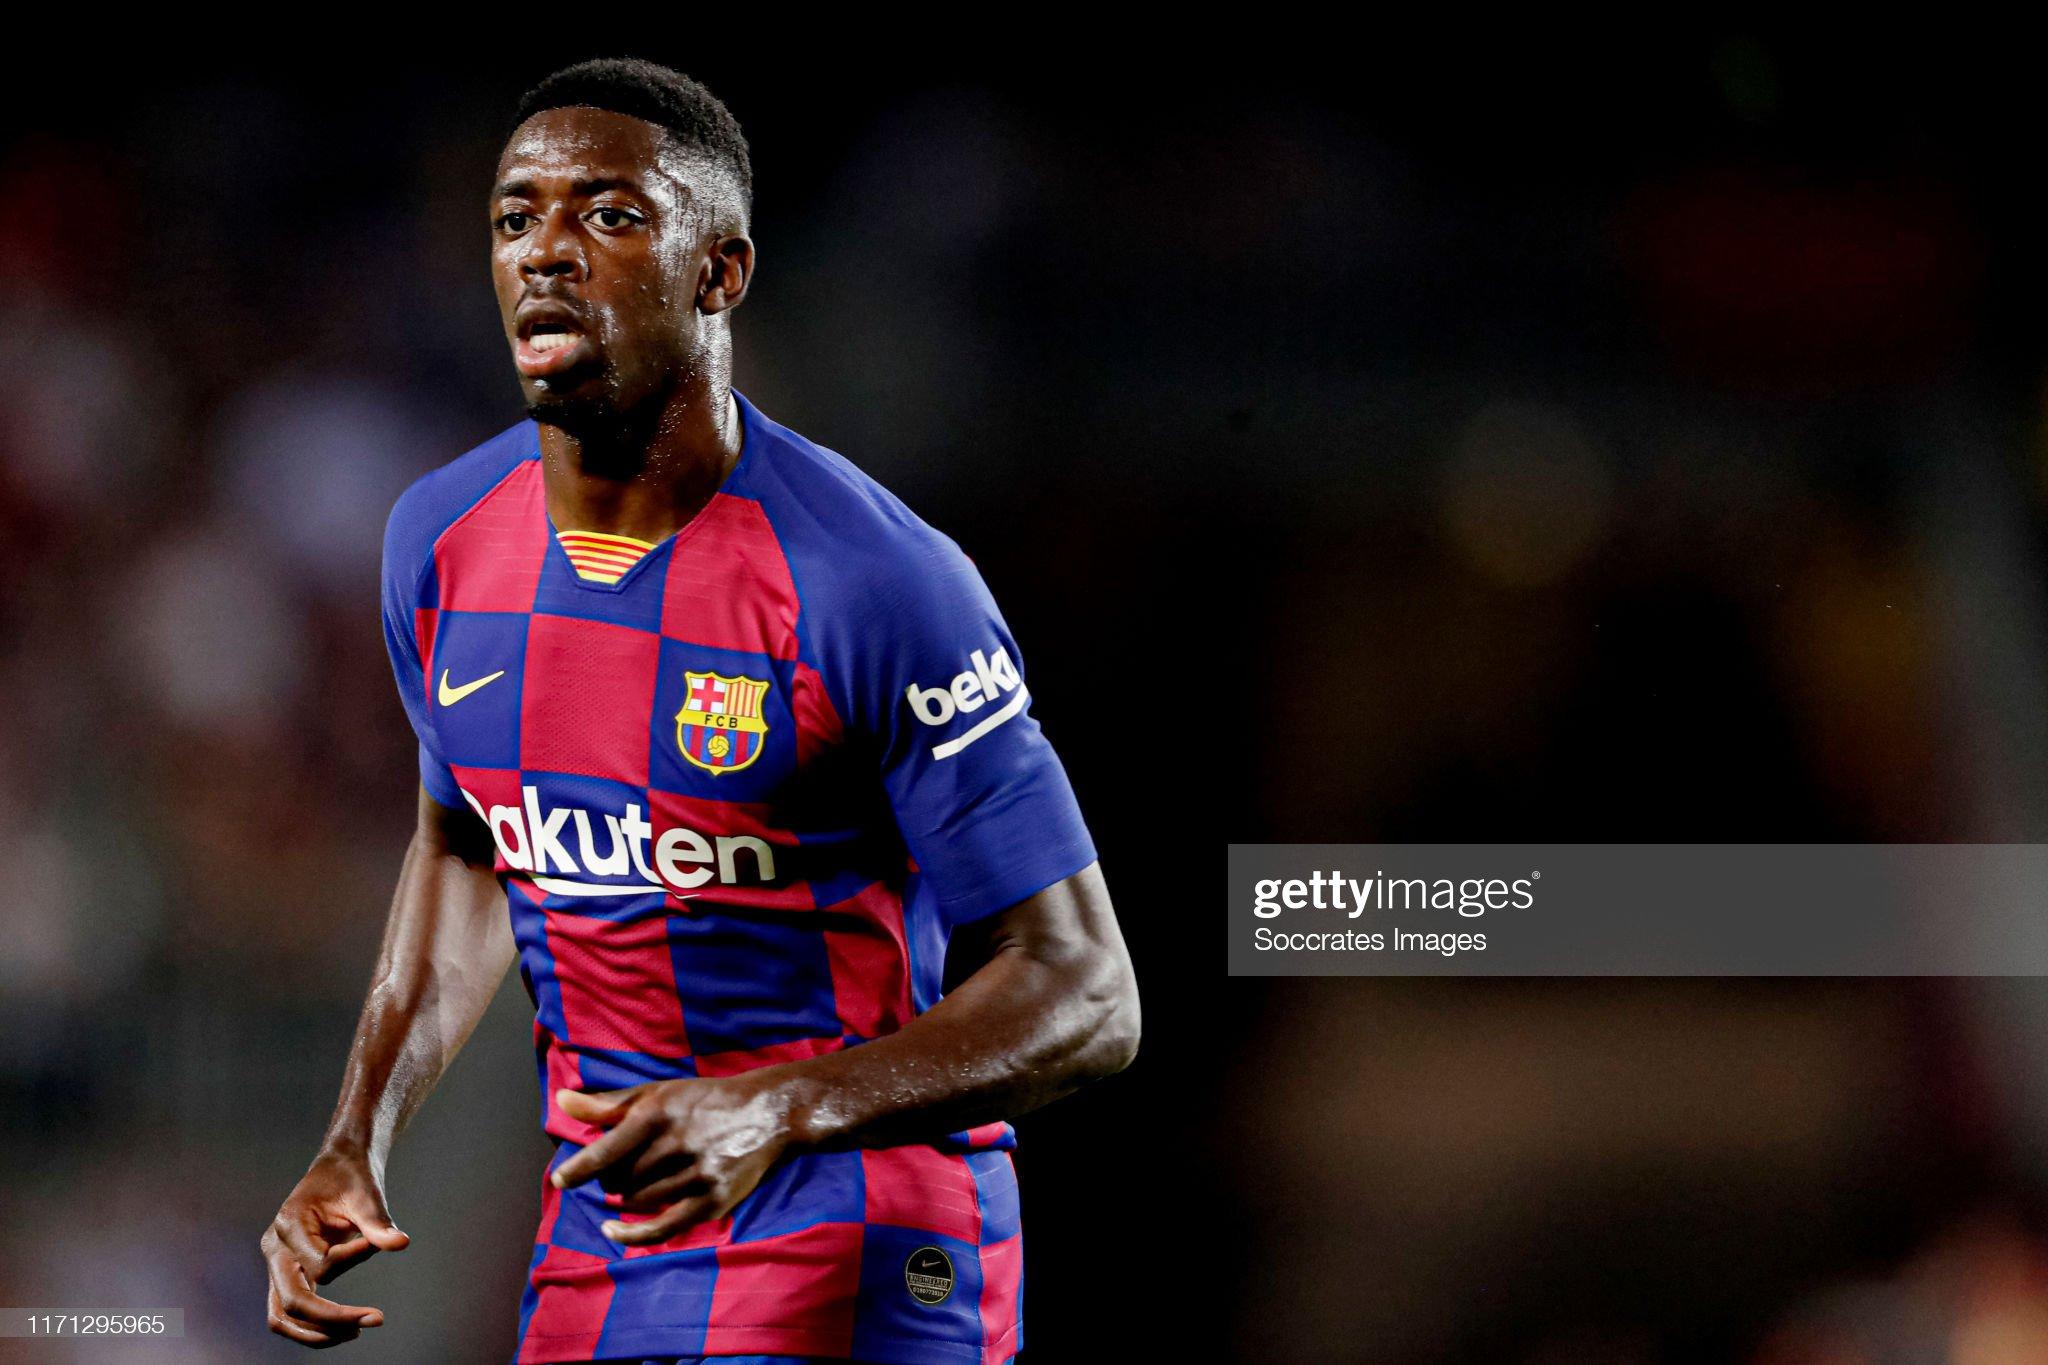 صور مباراة : برشلونة - فياريال 2-1 ( 24-09-2019 )  Ousmane-dembele-of-fc-barcelona-during-the-la-liga-santander-match-picture-id1171295965?s=2048x2048